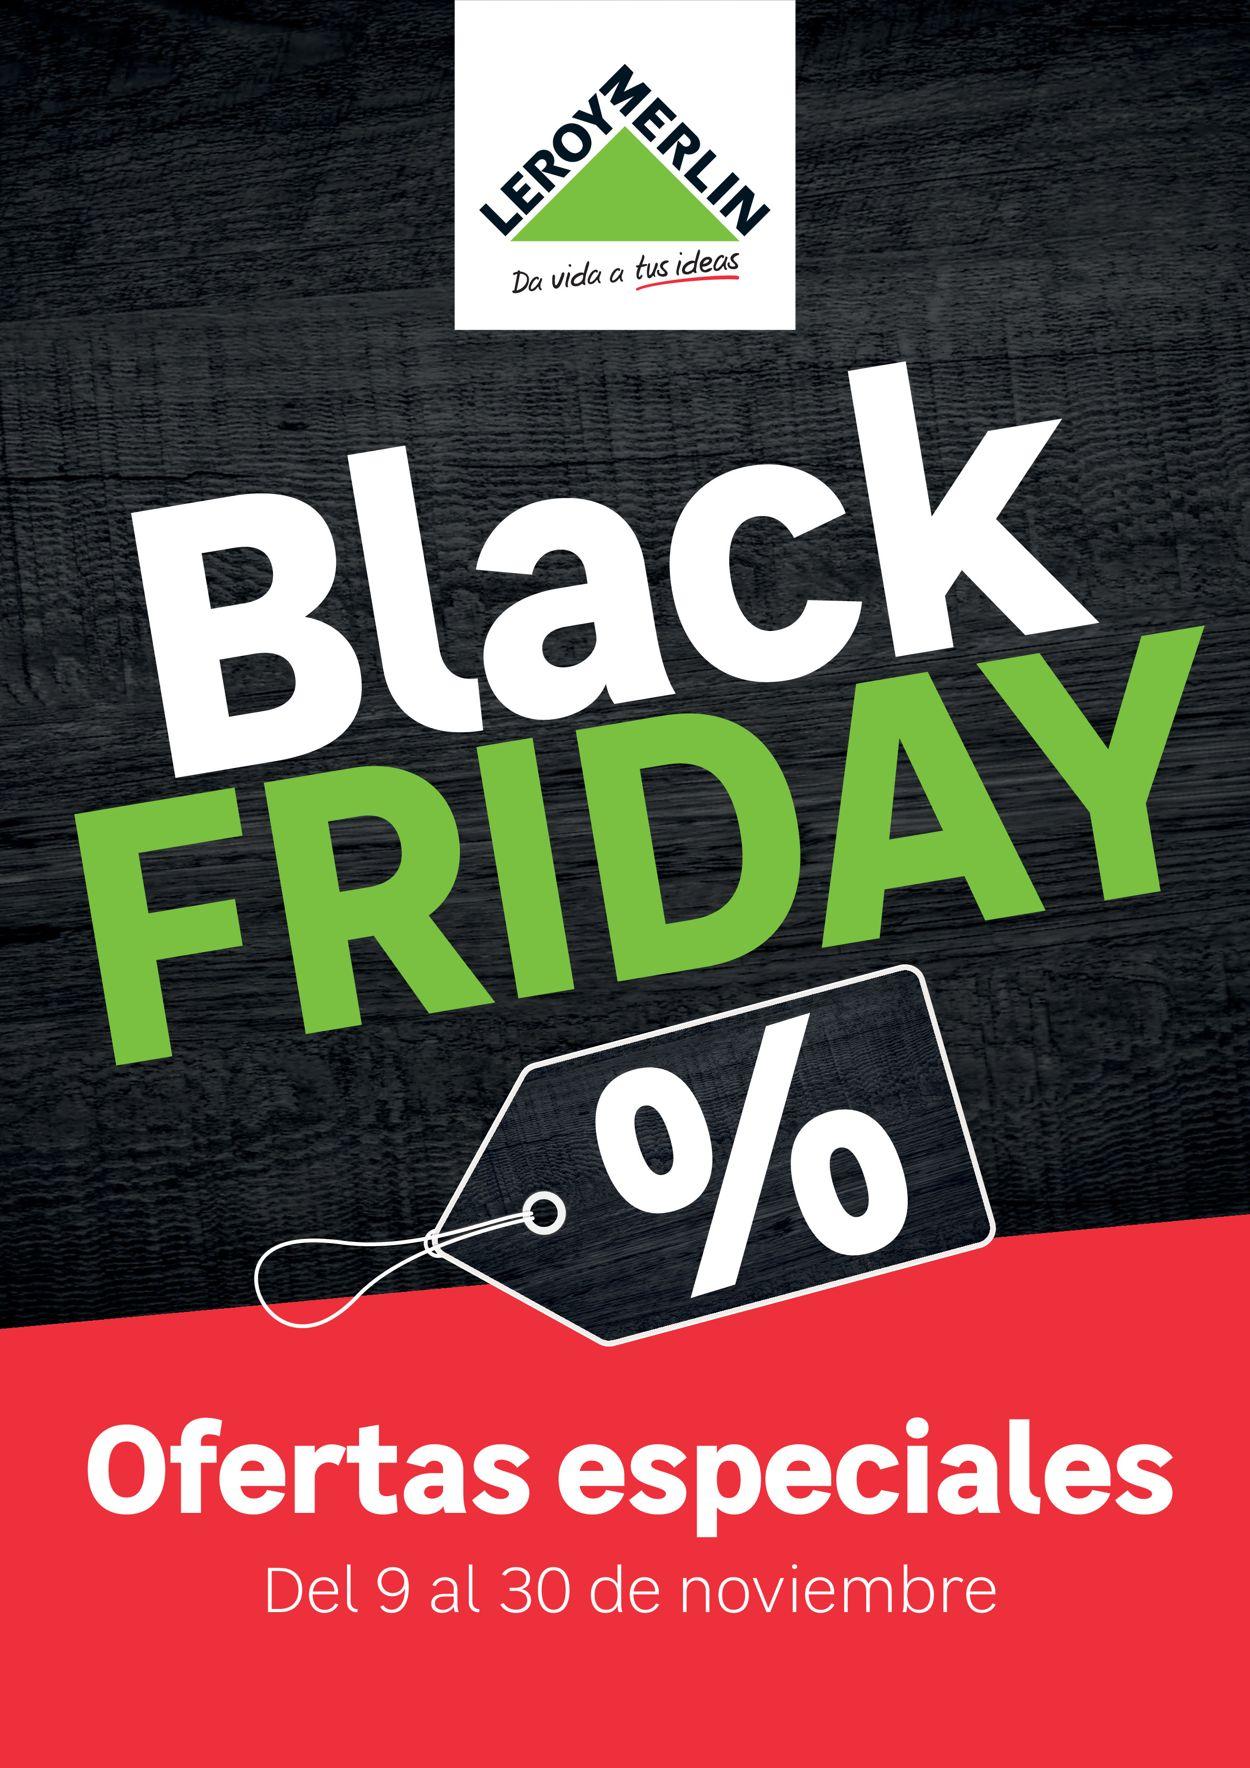 AKI Black Friday 2020 Folleto - 09.11-30.11.2020